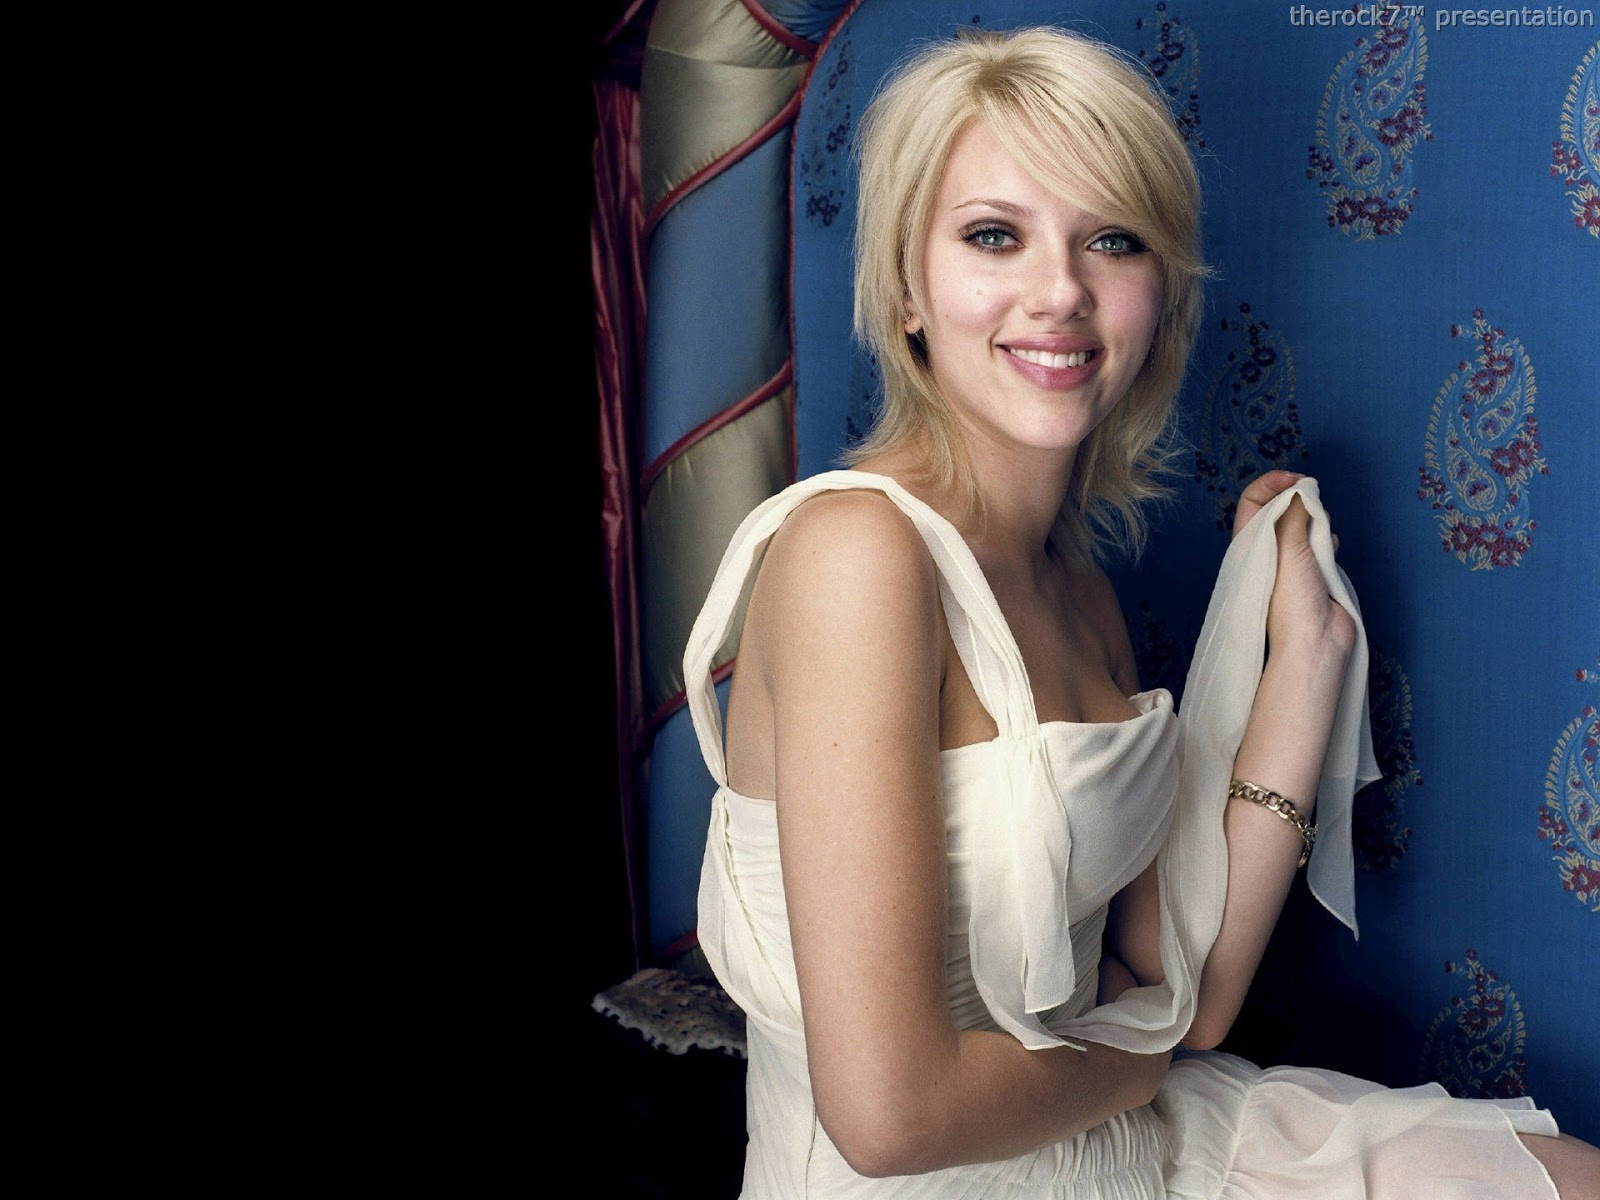 http://4.bp.blogspot.com/-ecW6nNcefos/UIEaBHbQrPI/AAAAAAAAJJA/y-dhj3x04ck/s1600/Scarlett+Johansson+(9).jpg